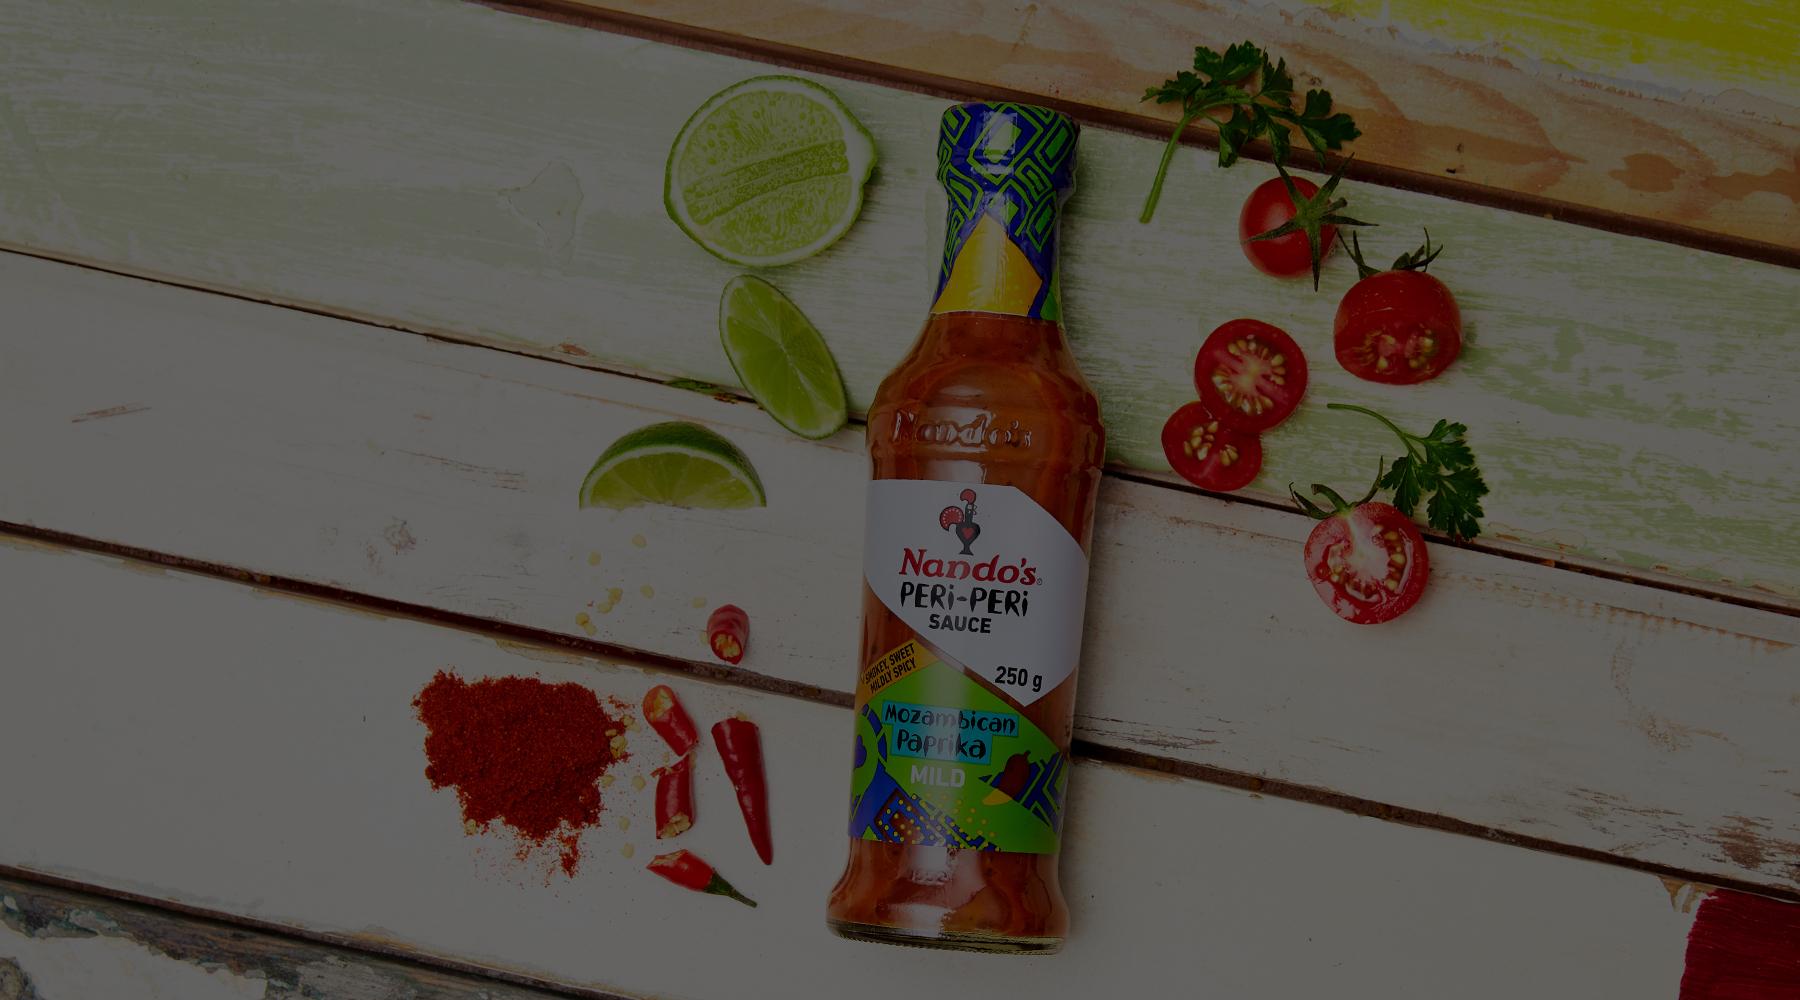 Mozam Paprika PERi-PERi Sauce